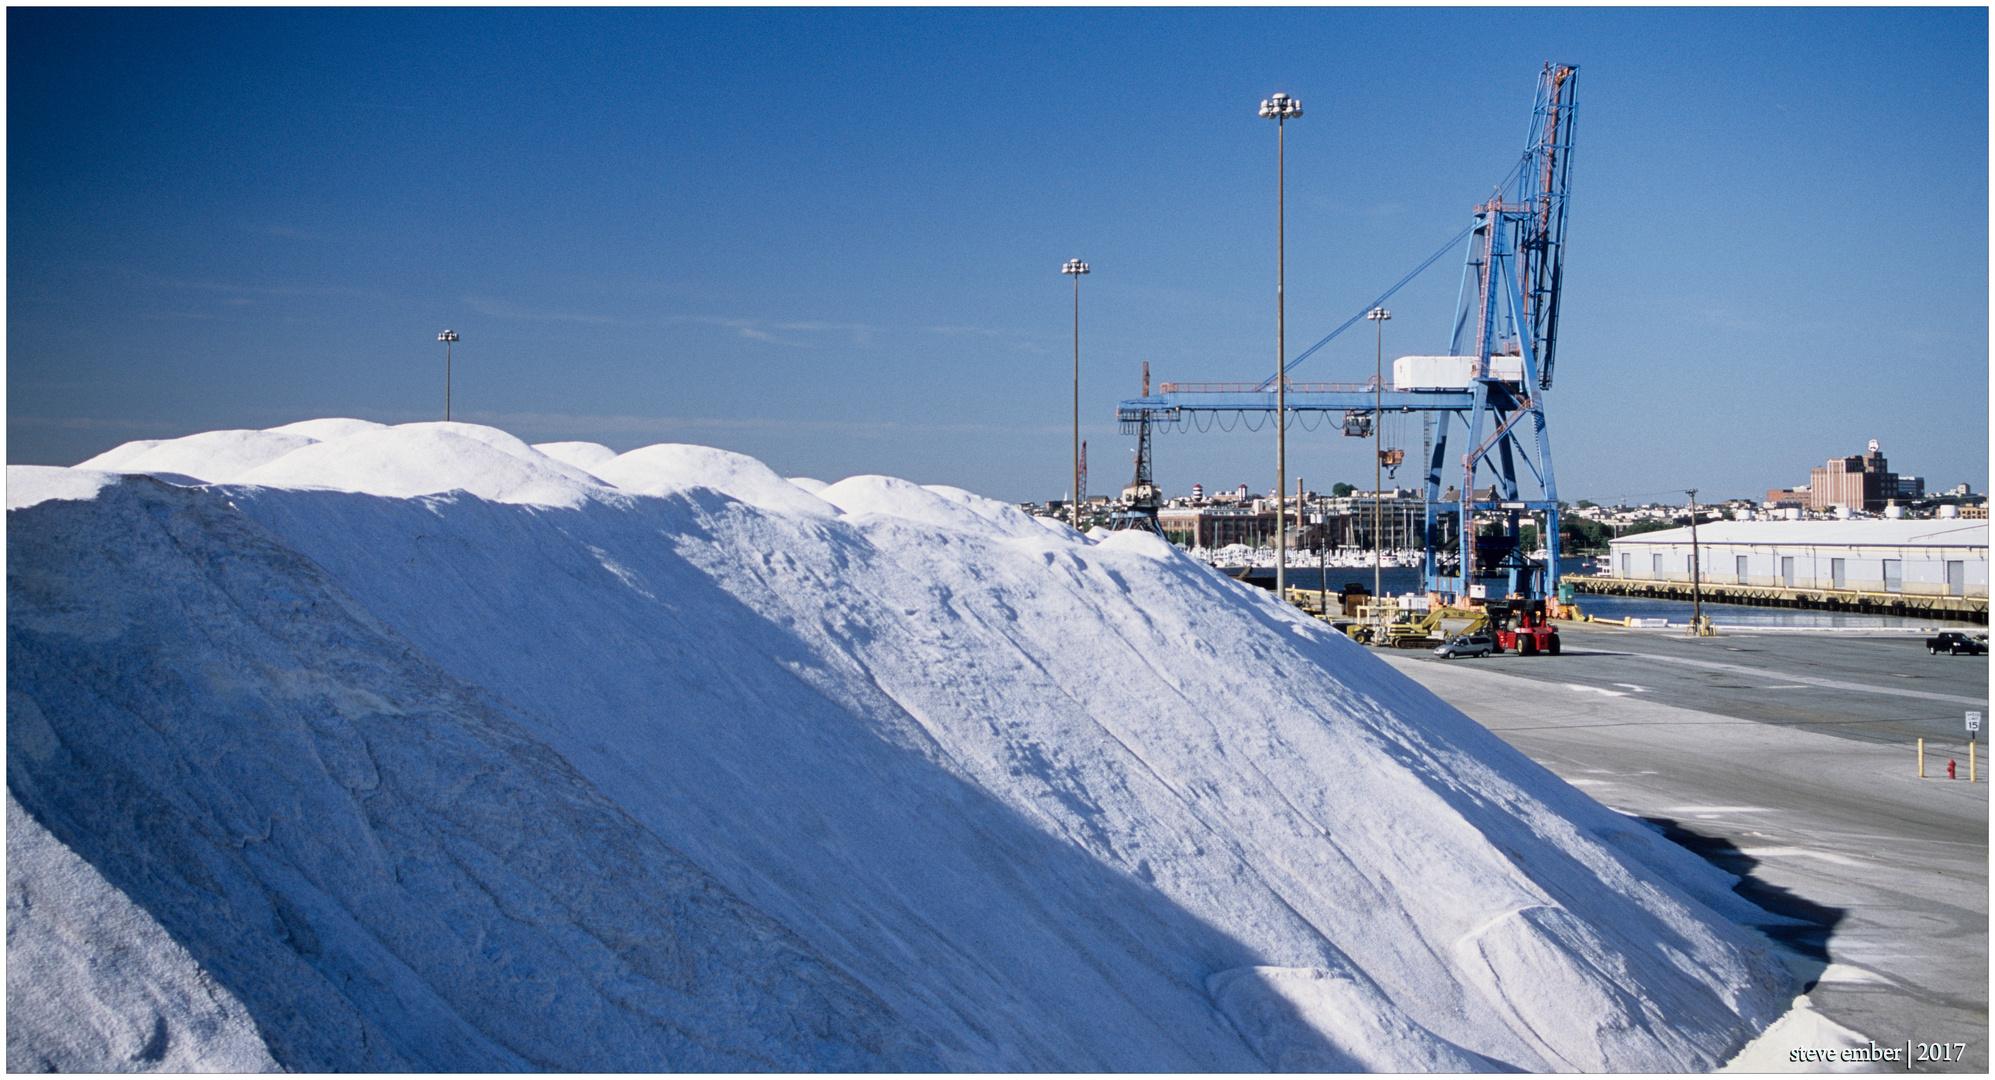 Salt Pile and Gantry